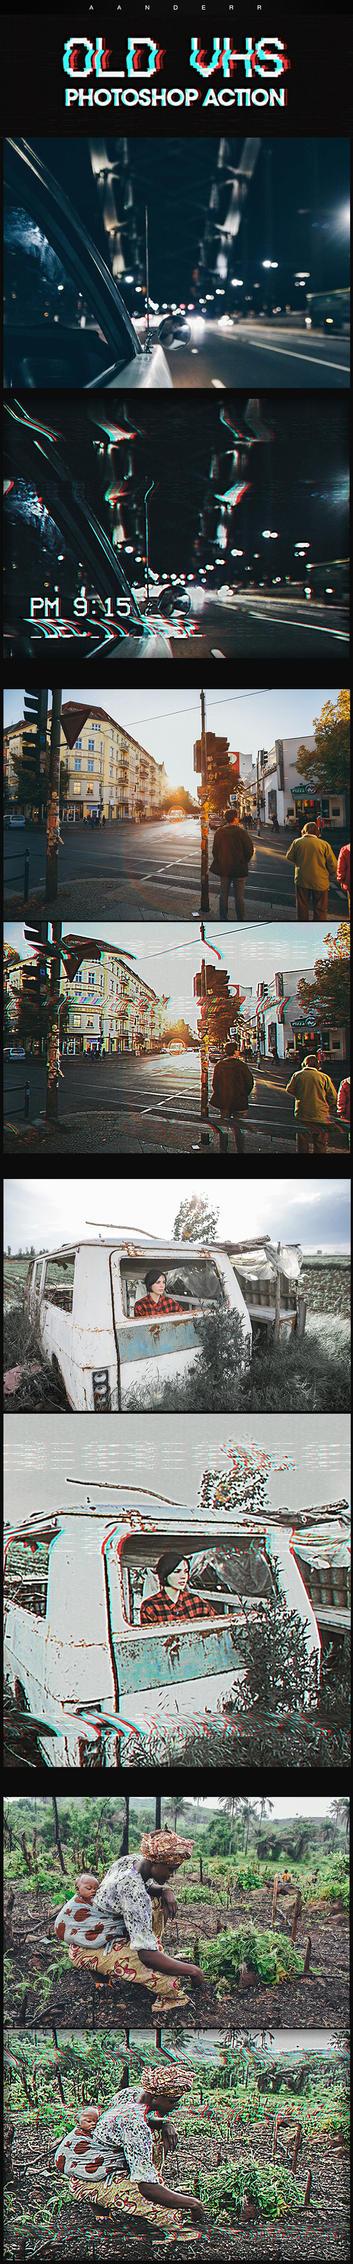 Old VHS Photoshop Action by Kluzya